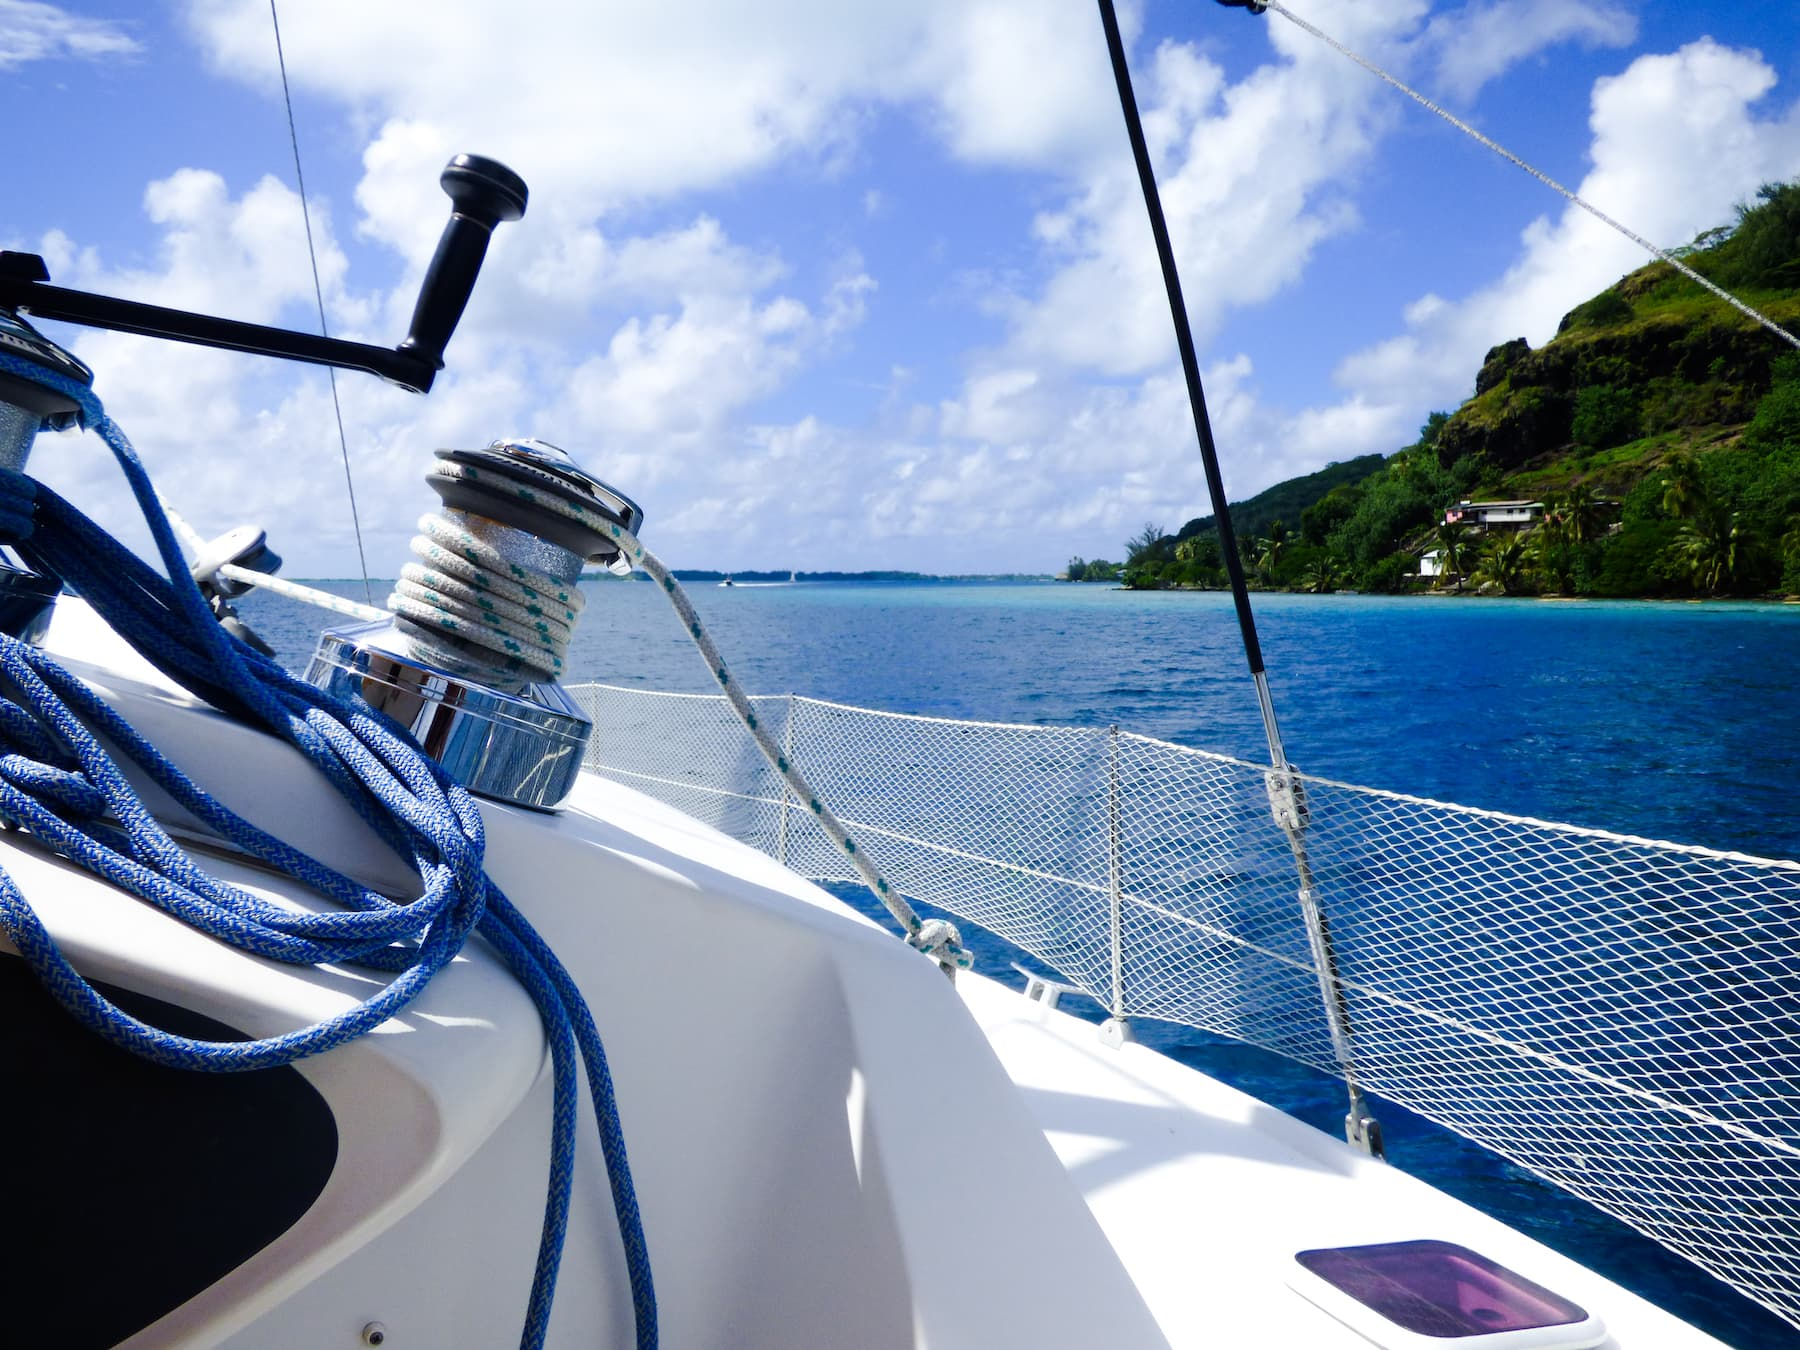 https://tahititourisme.nz/wp-content/uploads/2017/08/bateau-tlc-modif-13.jpg